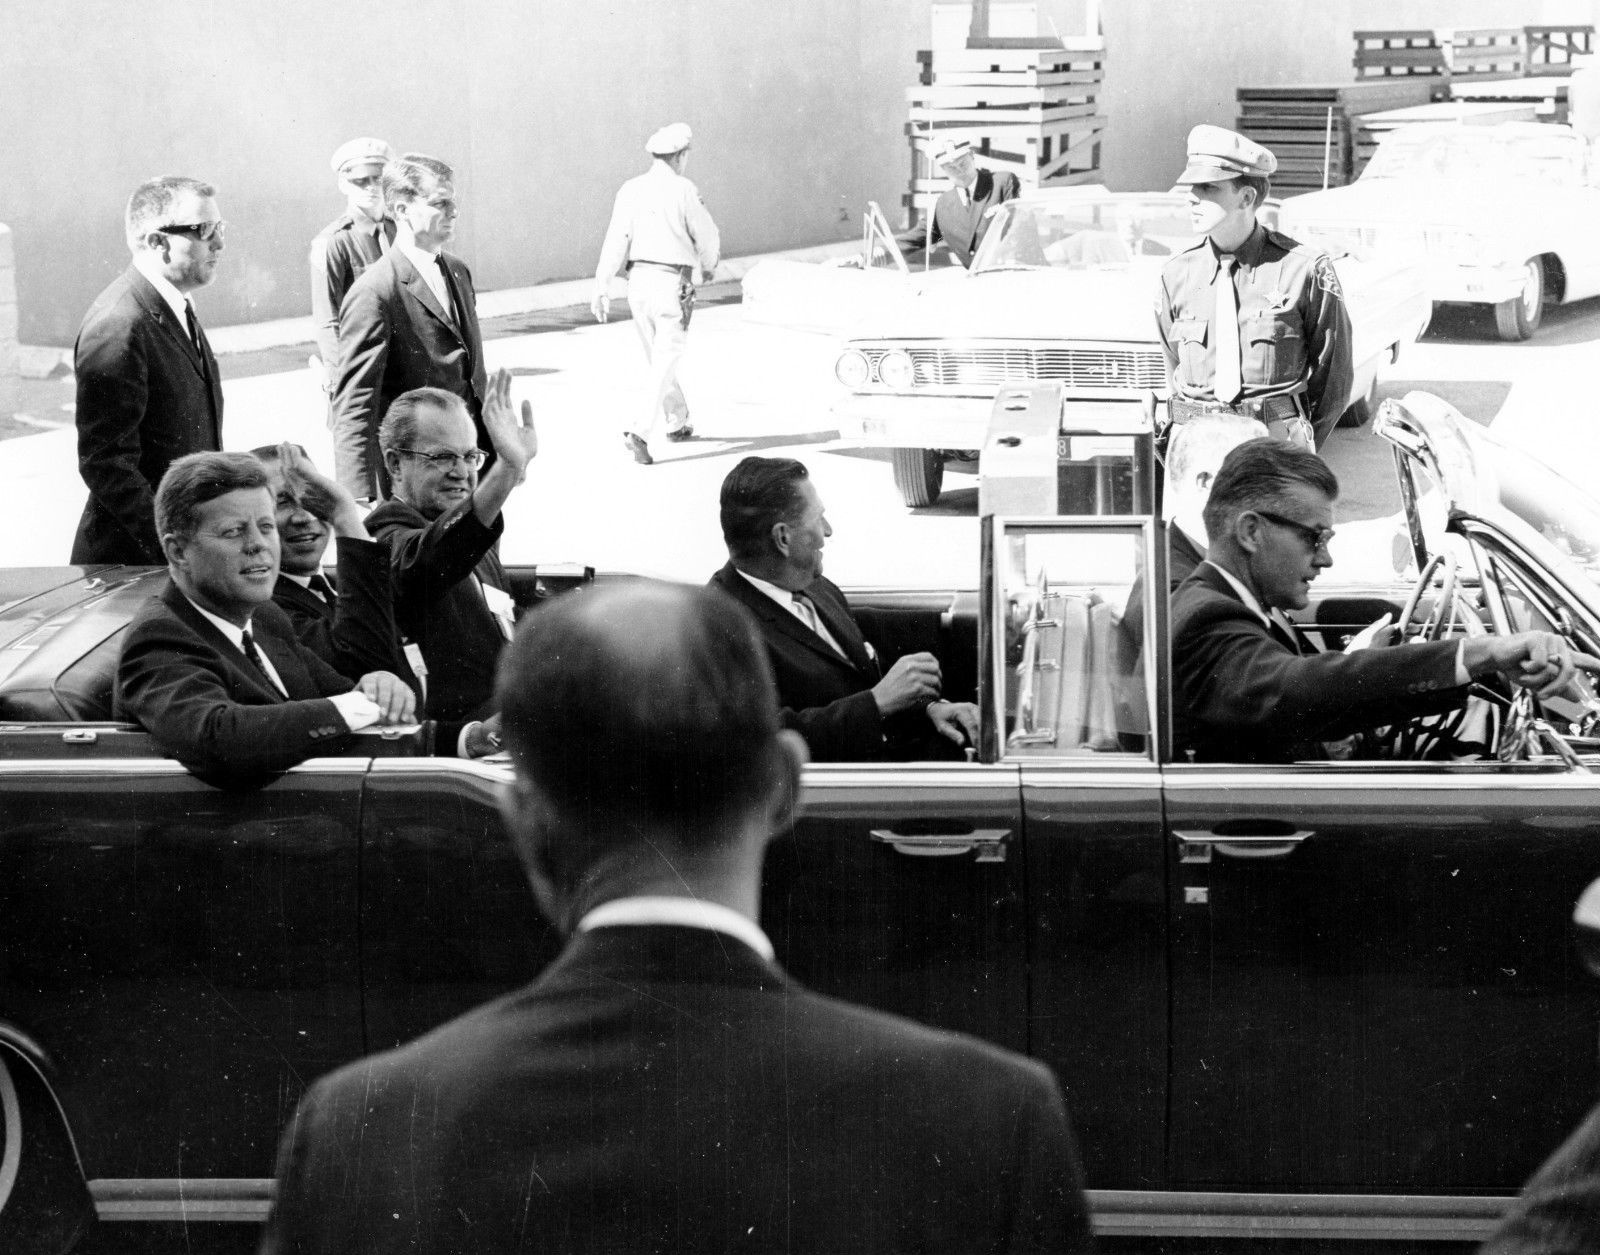 President Kennedy in Las Vegas September 1963. SA Gerald Blaine top left; SAIC Behn and SA Tom Shipman in limo